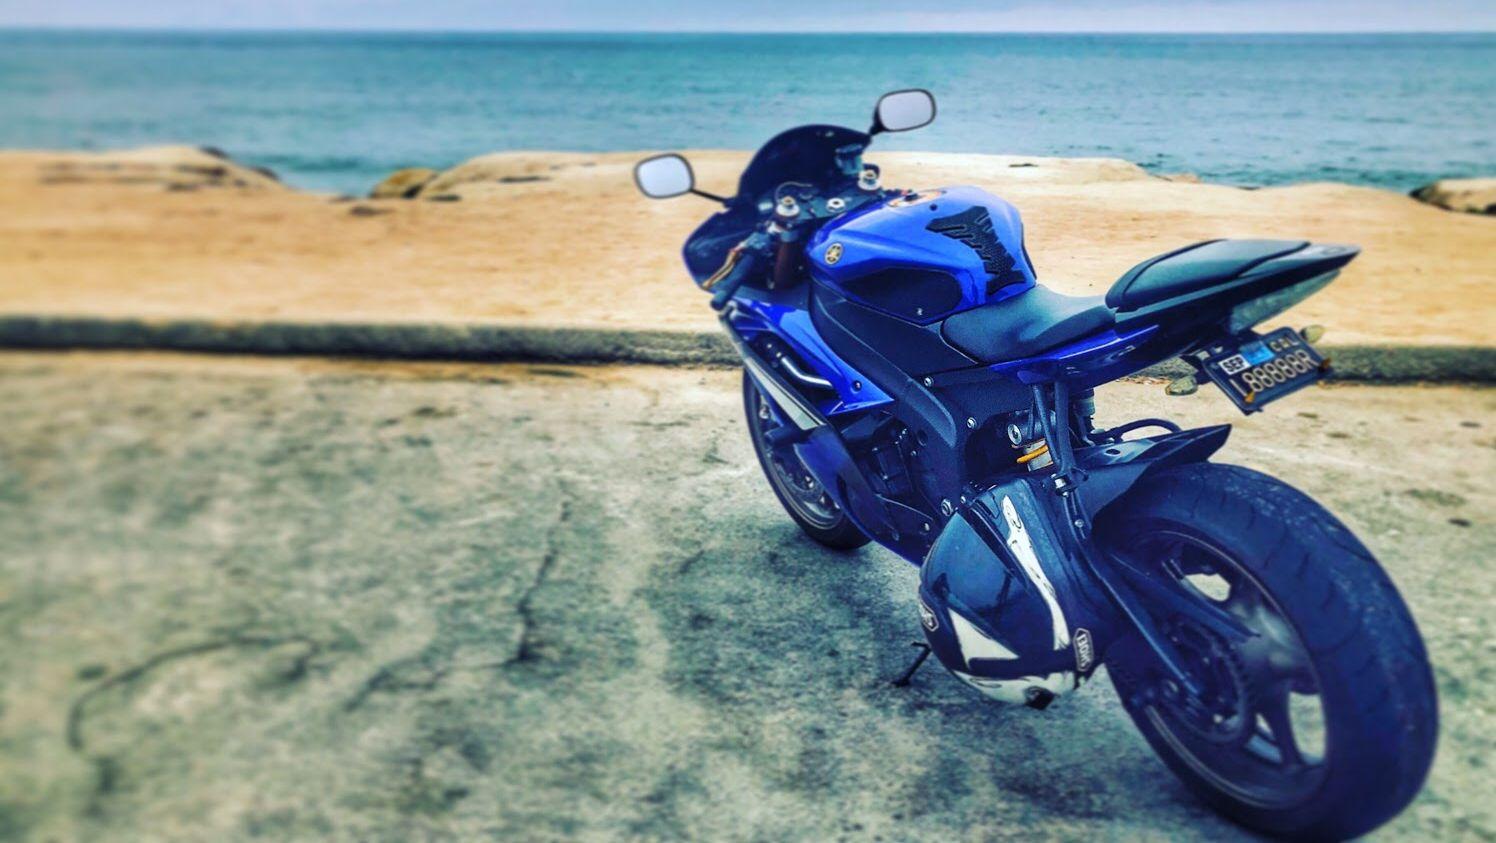 Yamaha Yzf R6 For Rent Near San Diego Ca Riders Share